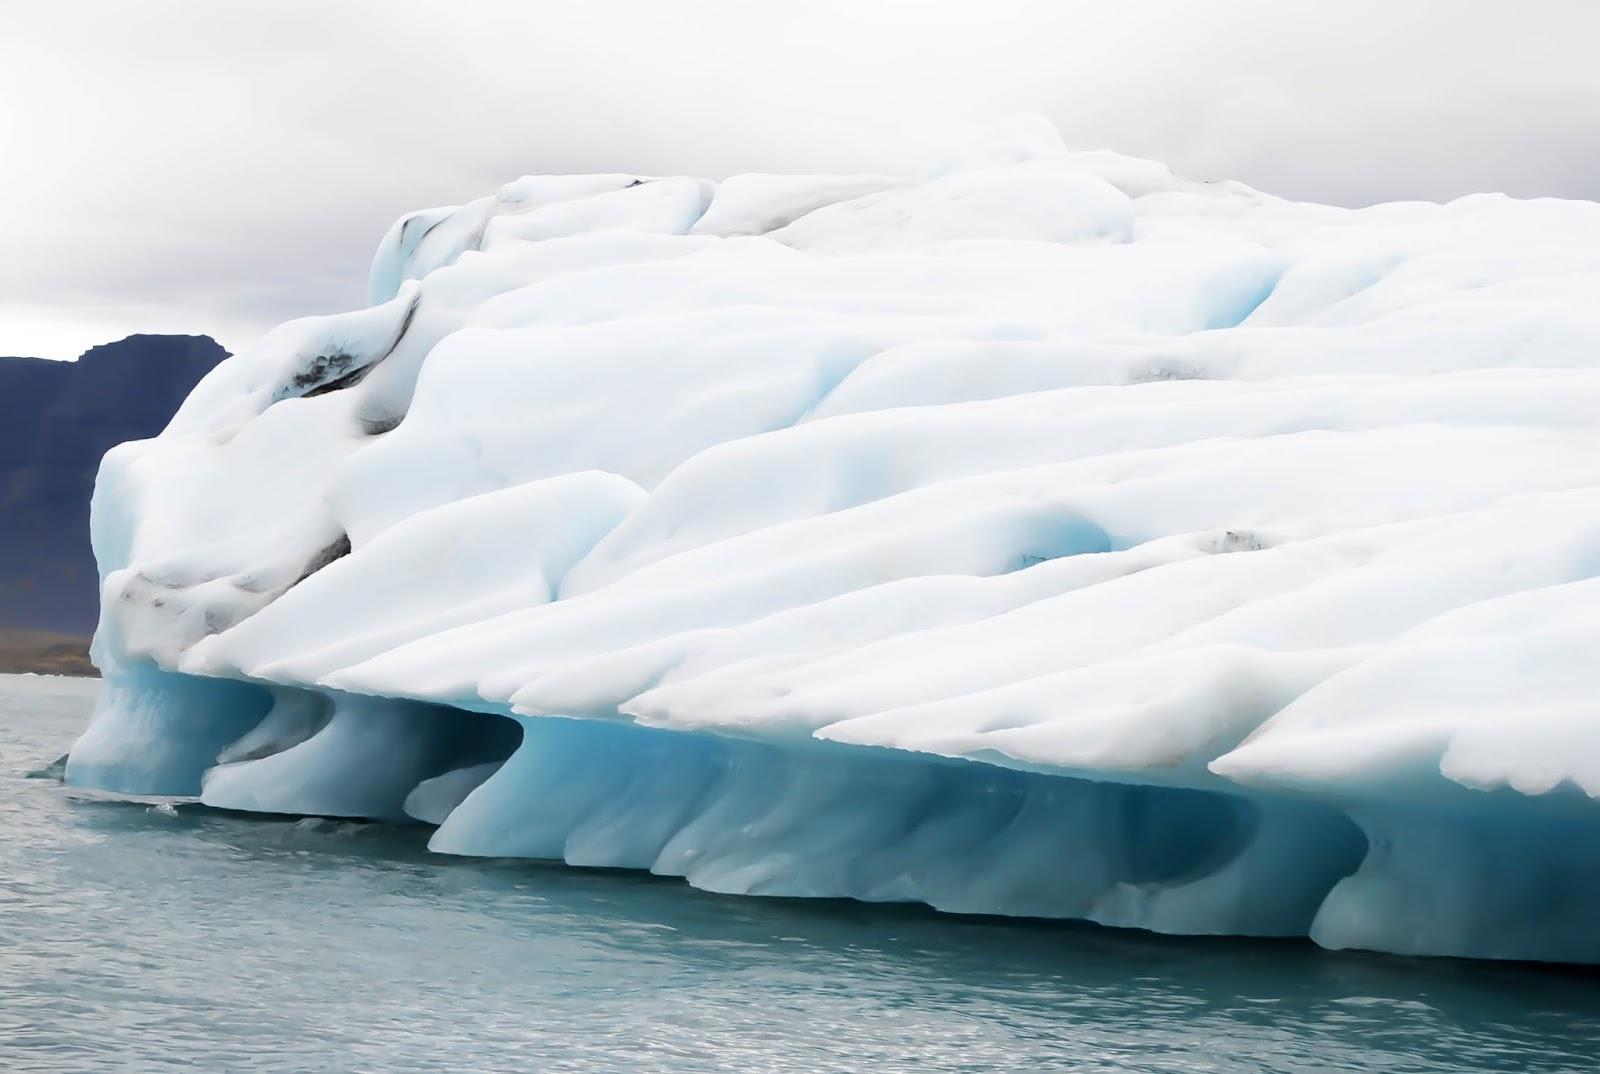 Icebergs in Jökulsárlón Glacier Lagoon in Iceland